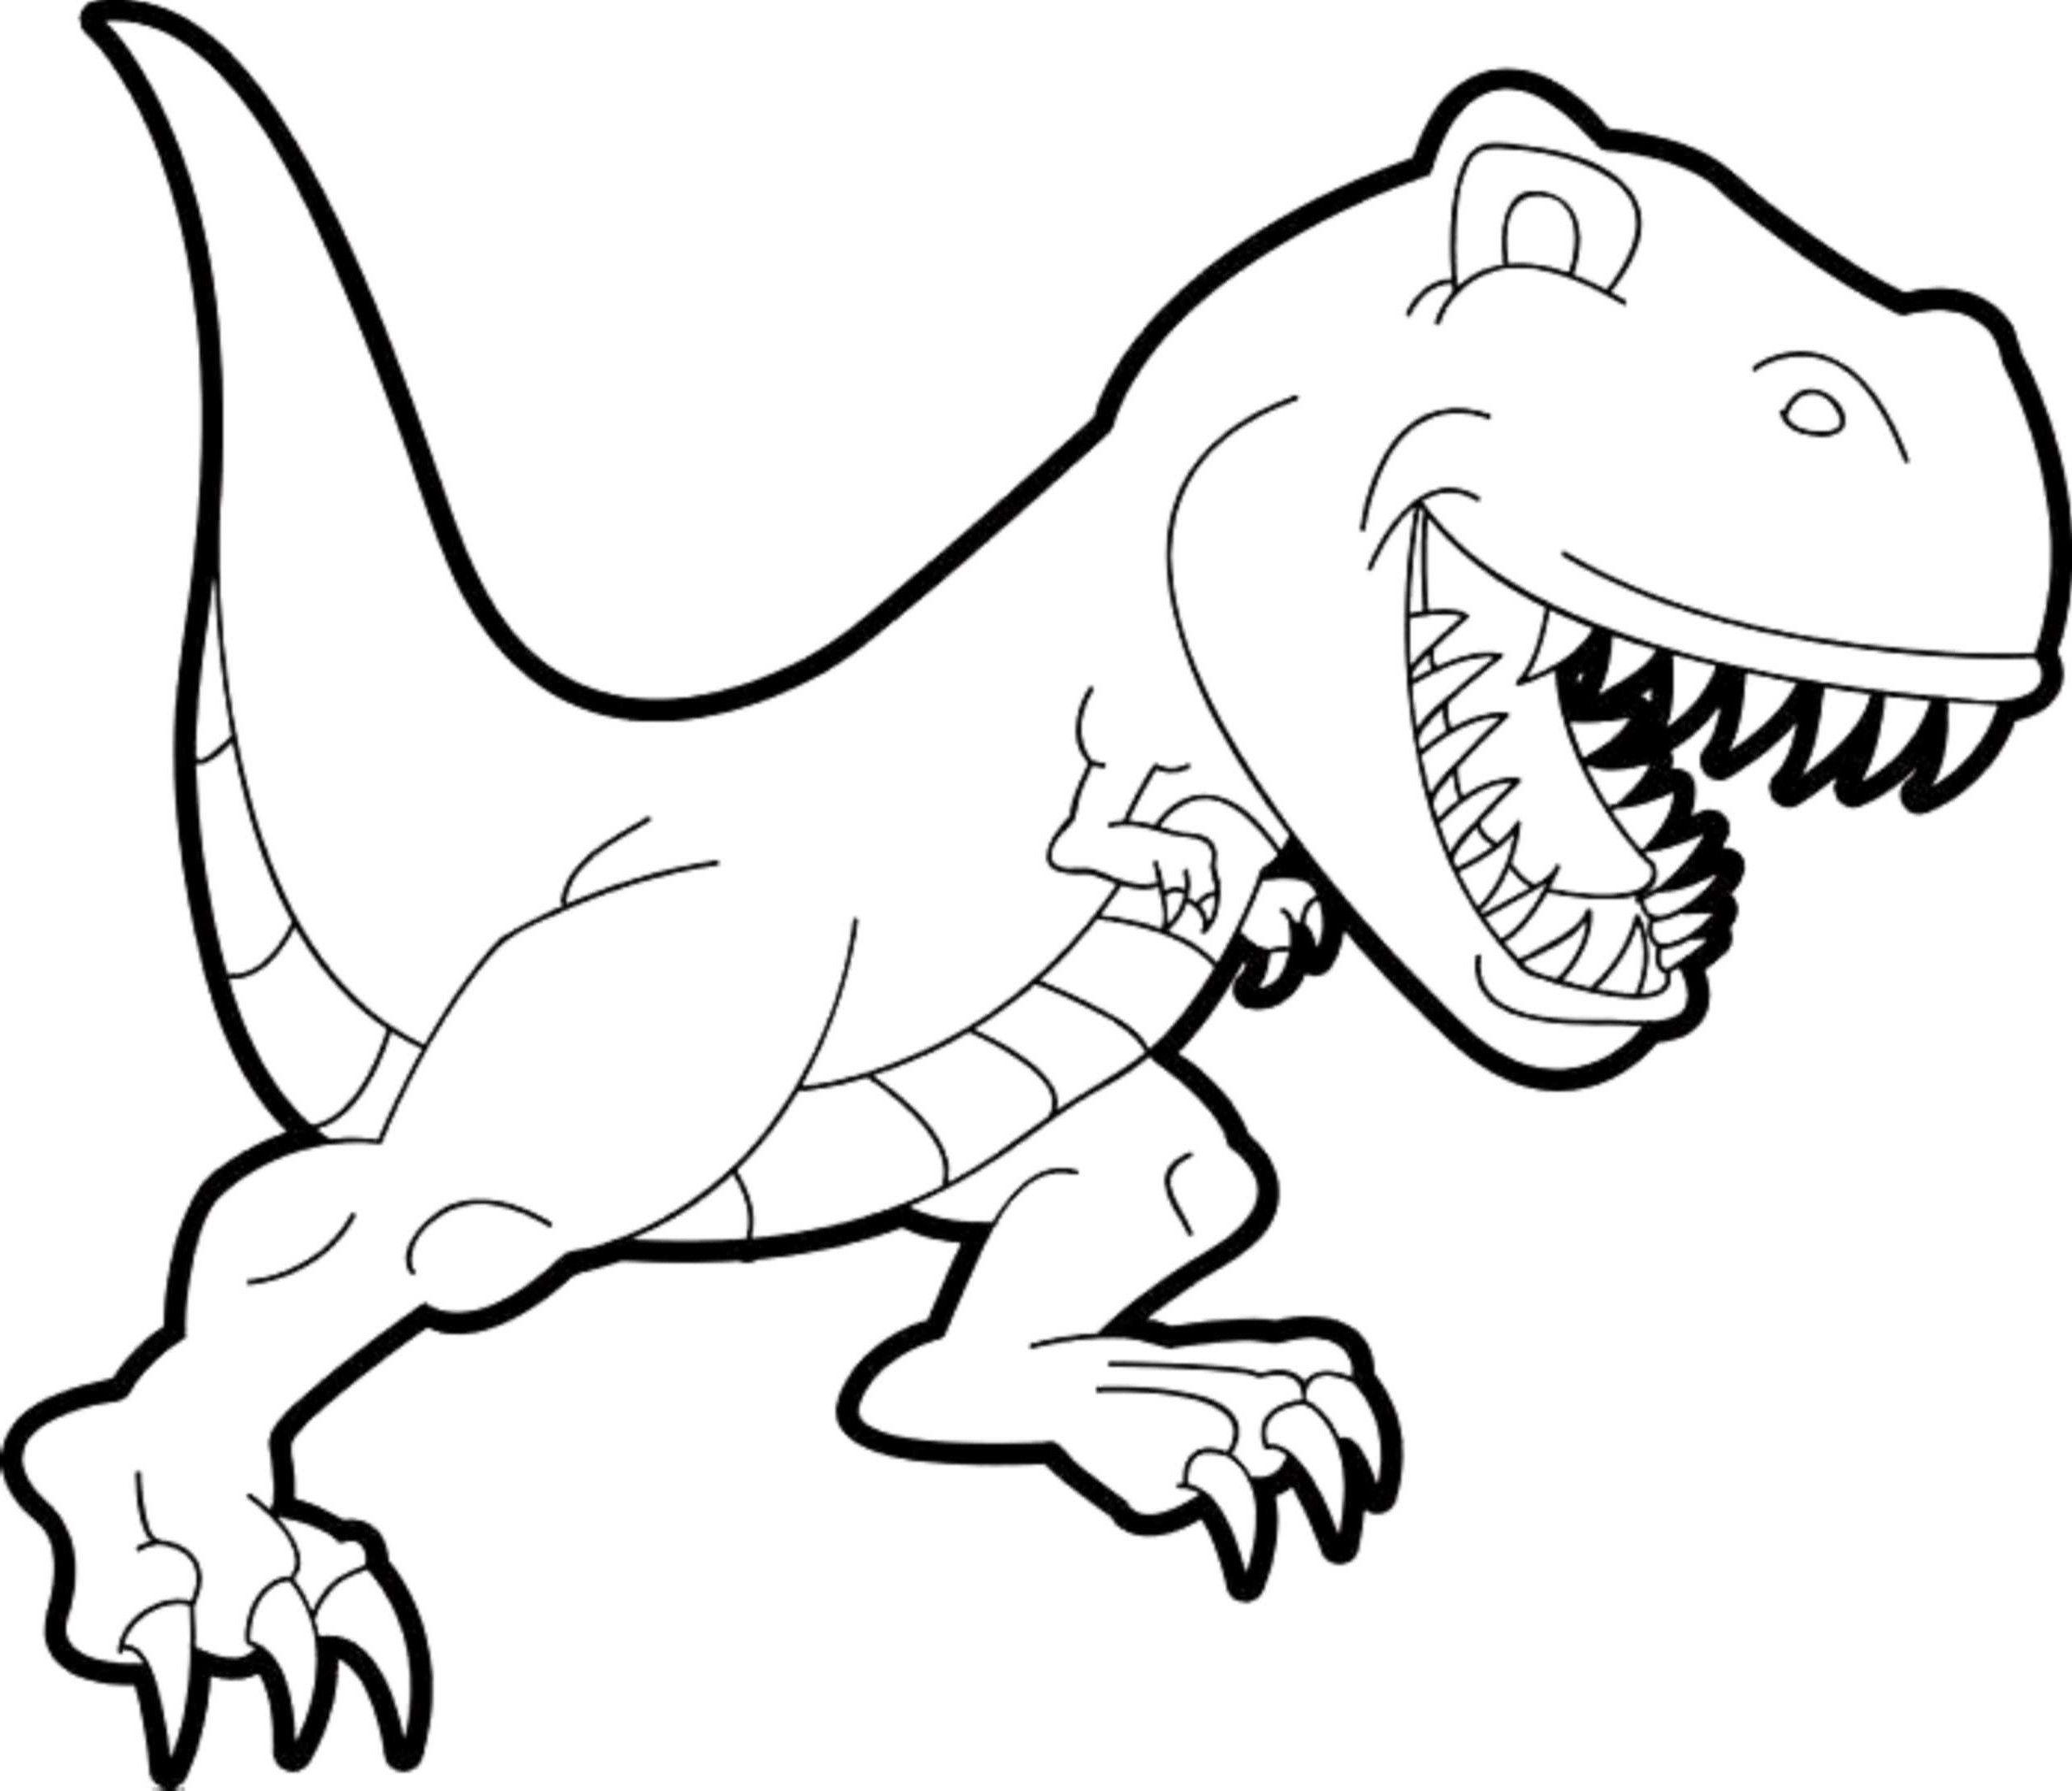 T Rex Da Colorare Unico Coloring Coloring Stunning T Rex Pages For Preschoolers Of T Rex Da C Disegni Da Colorare Disegni Disegni Bambini